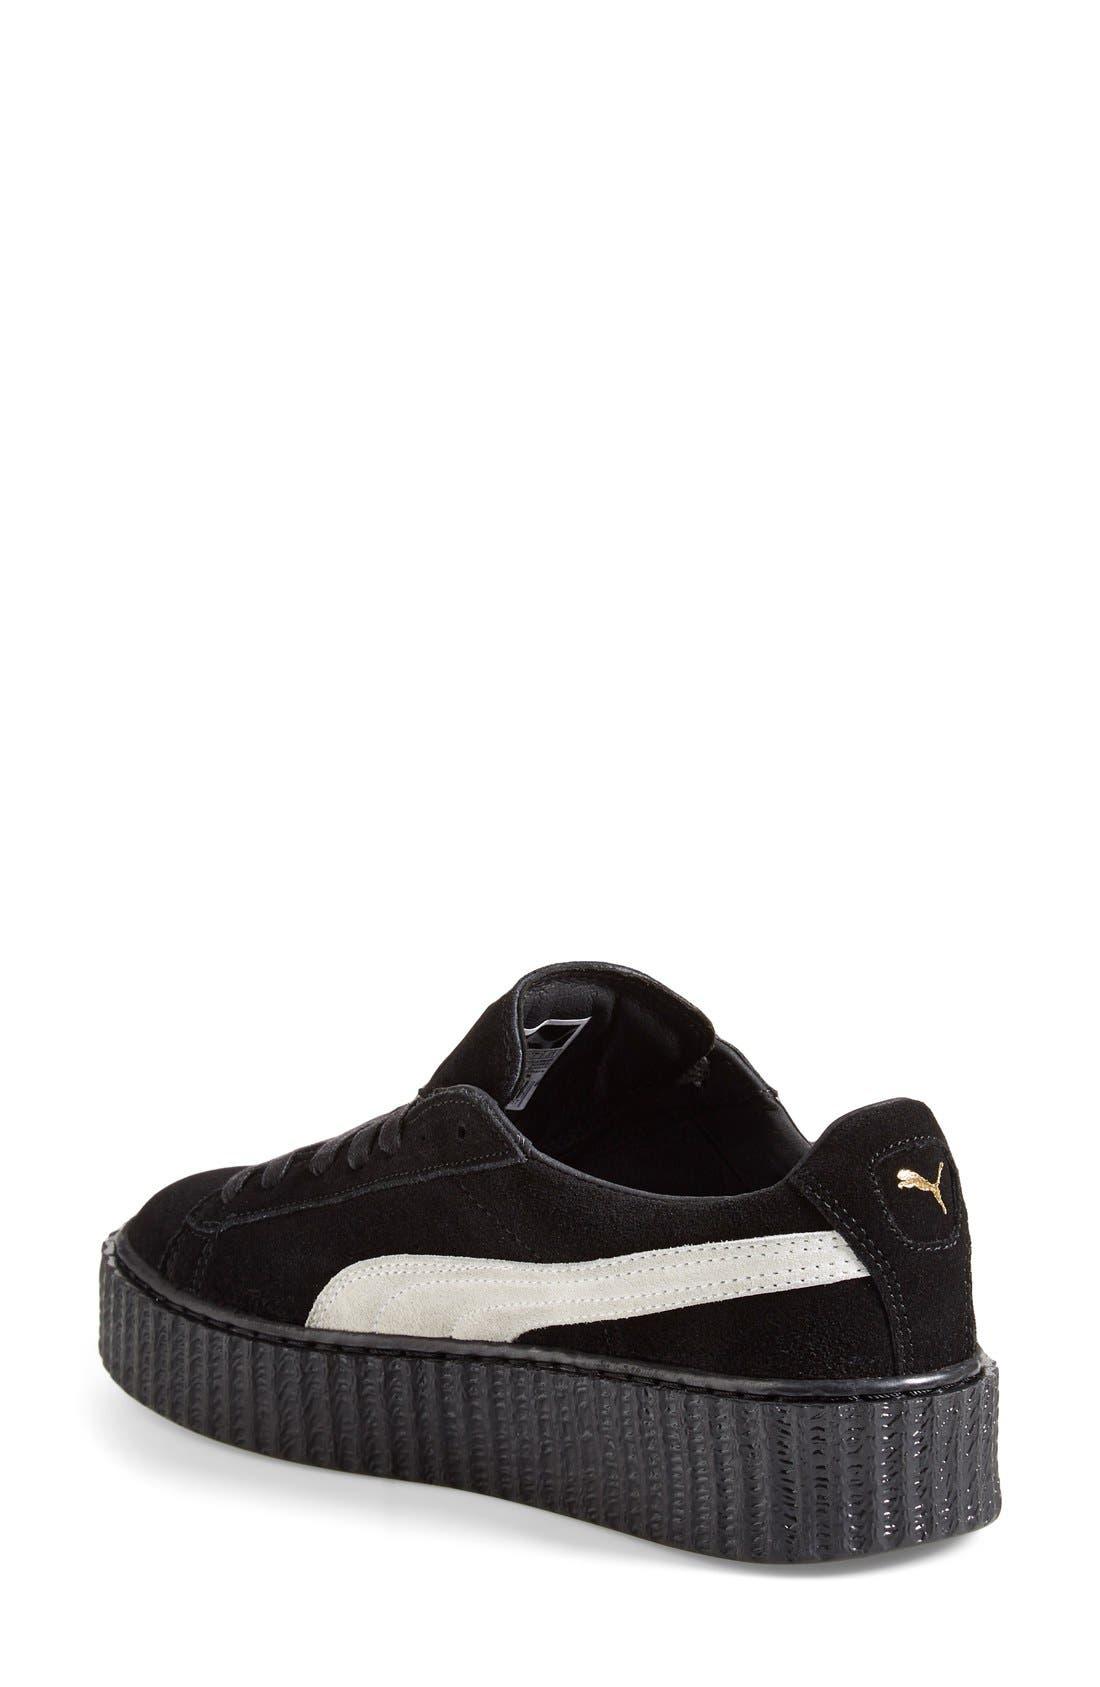 FENTY PUMA by Rihanna Creeper Sneaker,                             Alternate thumbnail 6, color,                             001